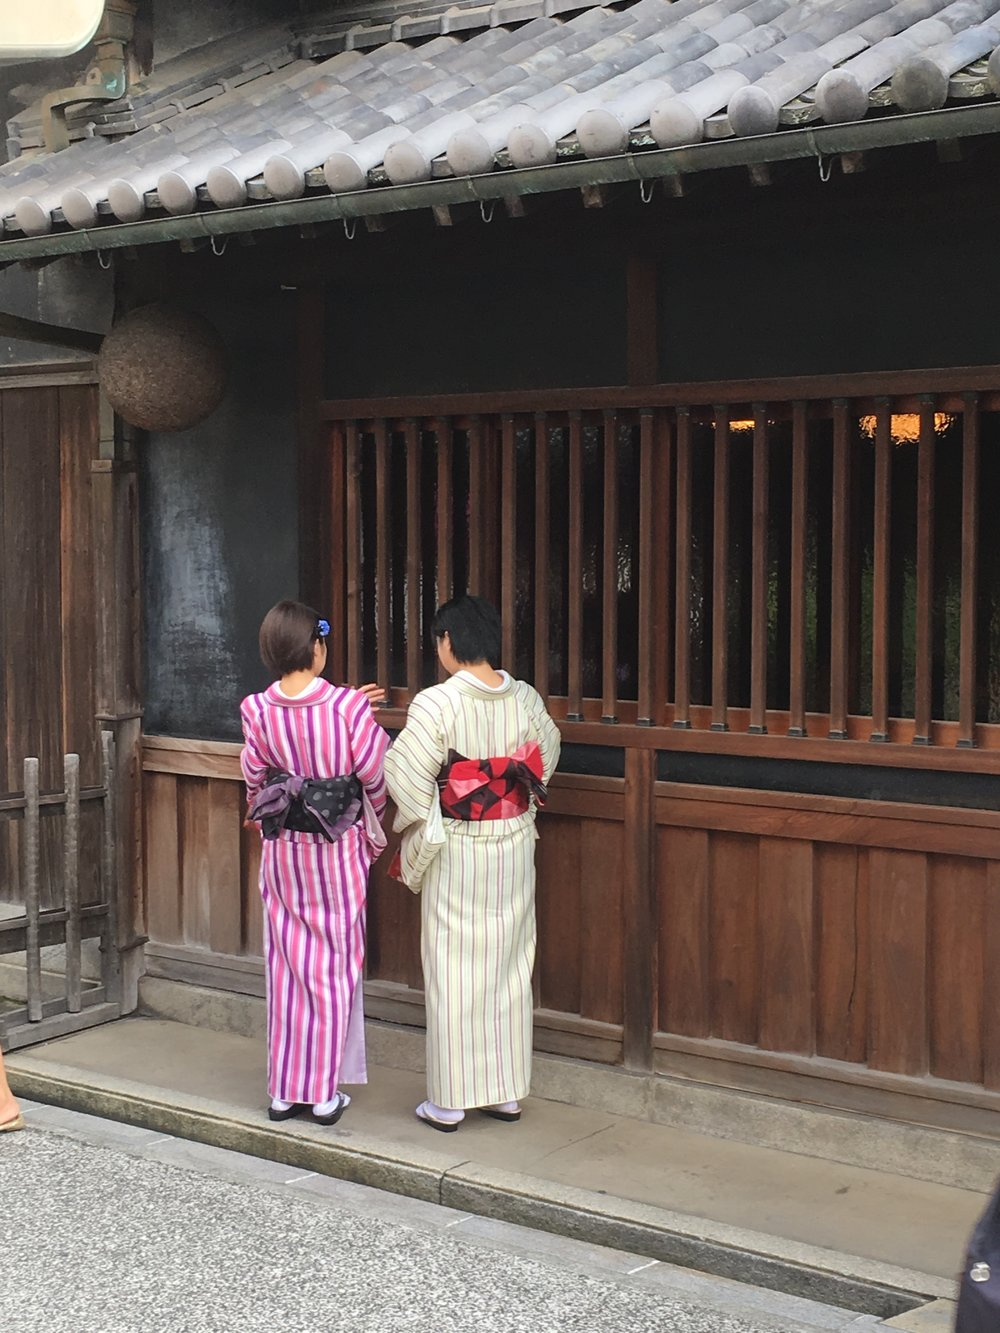 Old town of Kurashiki